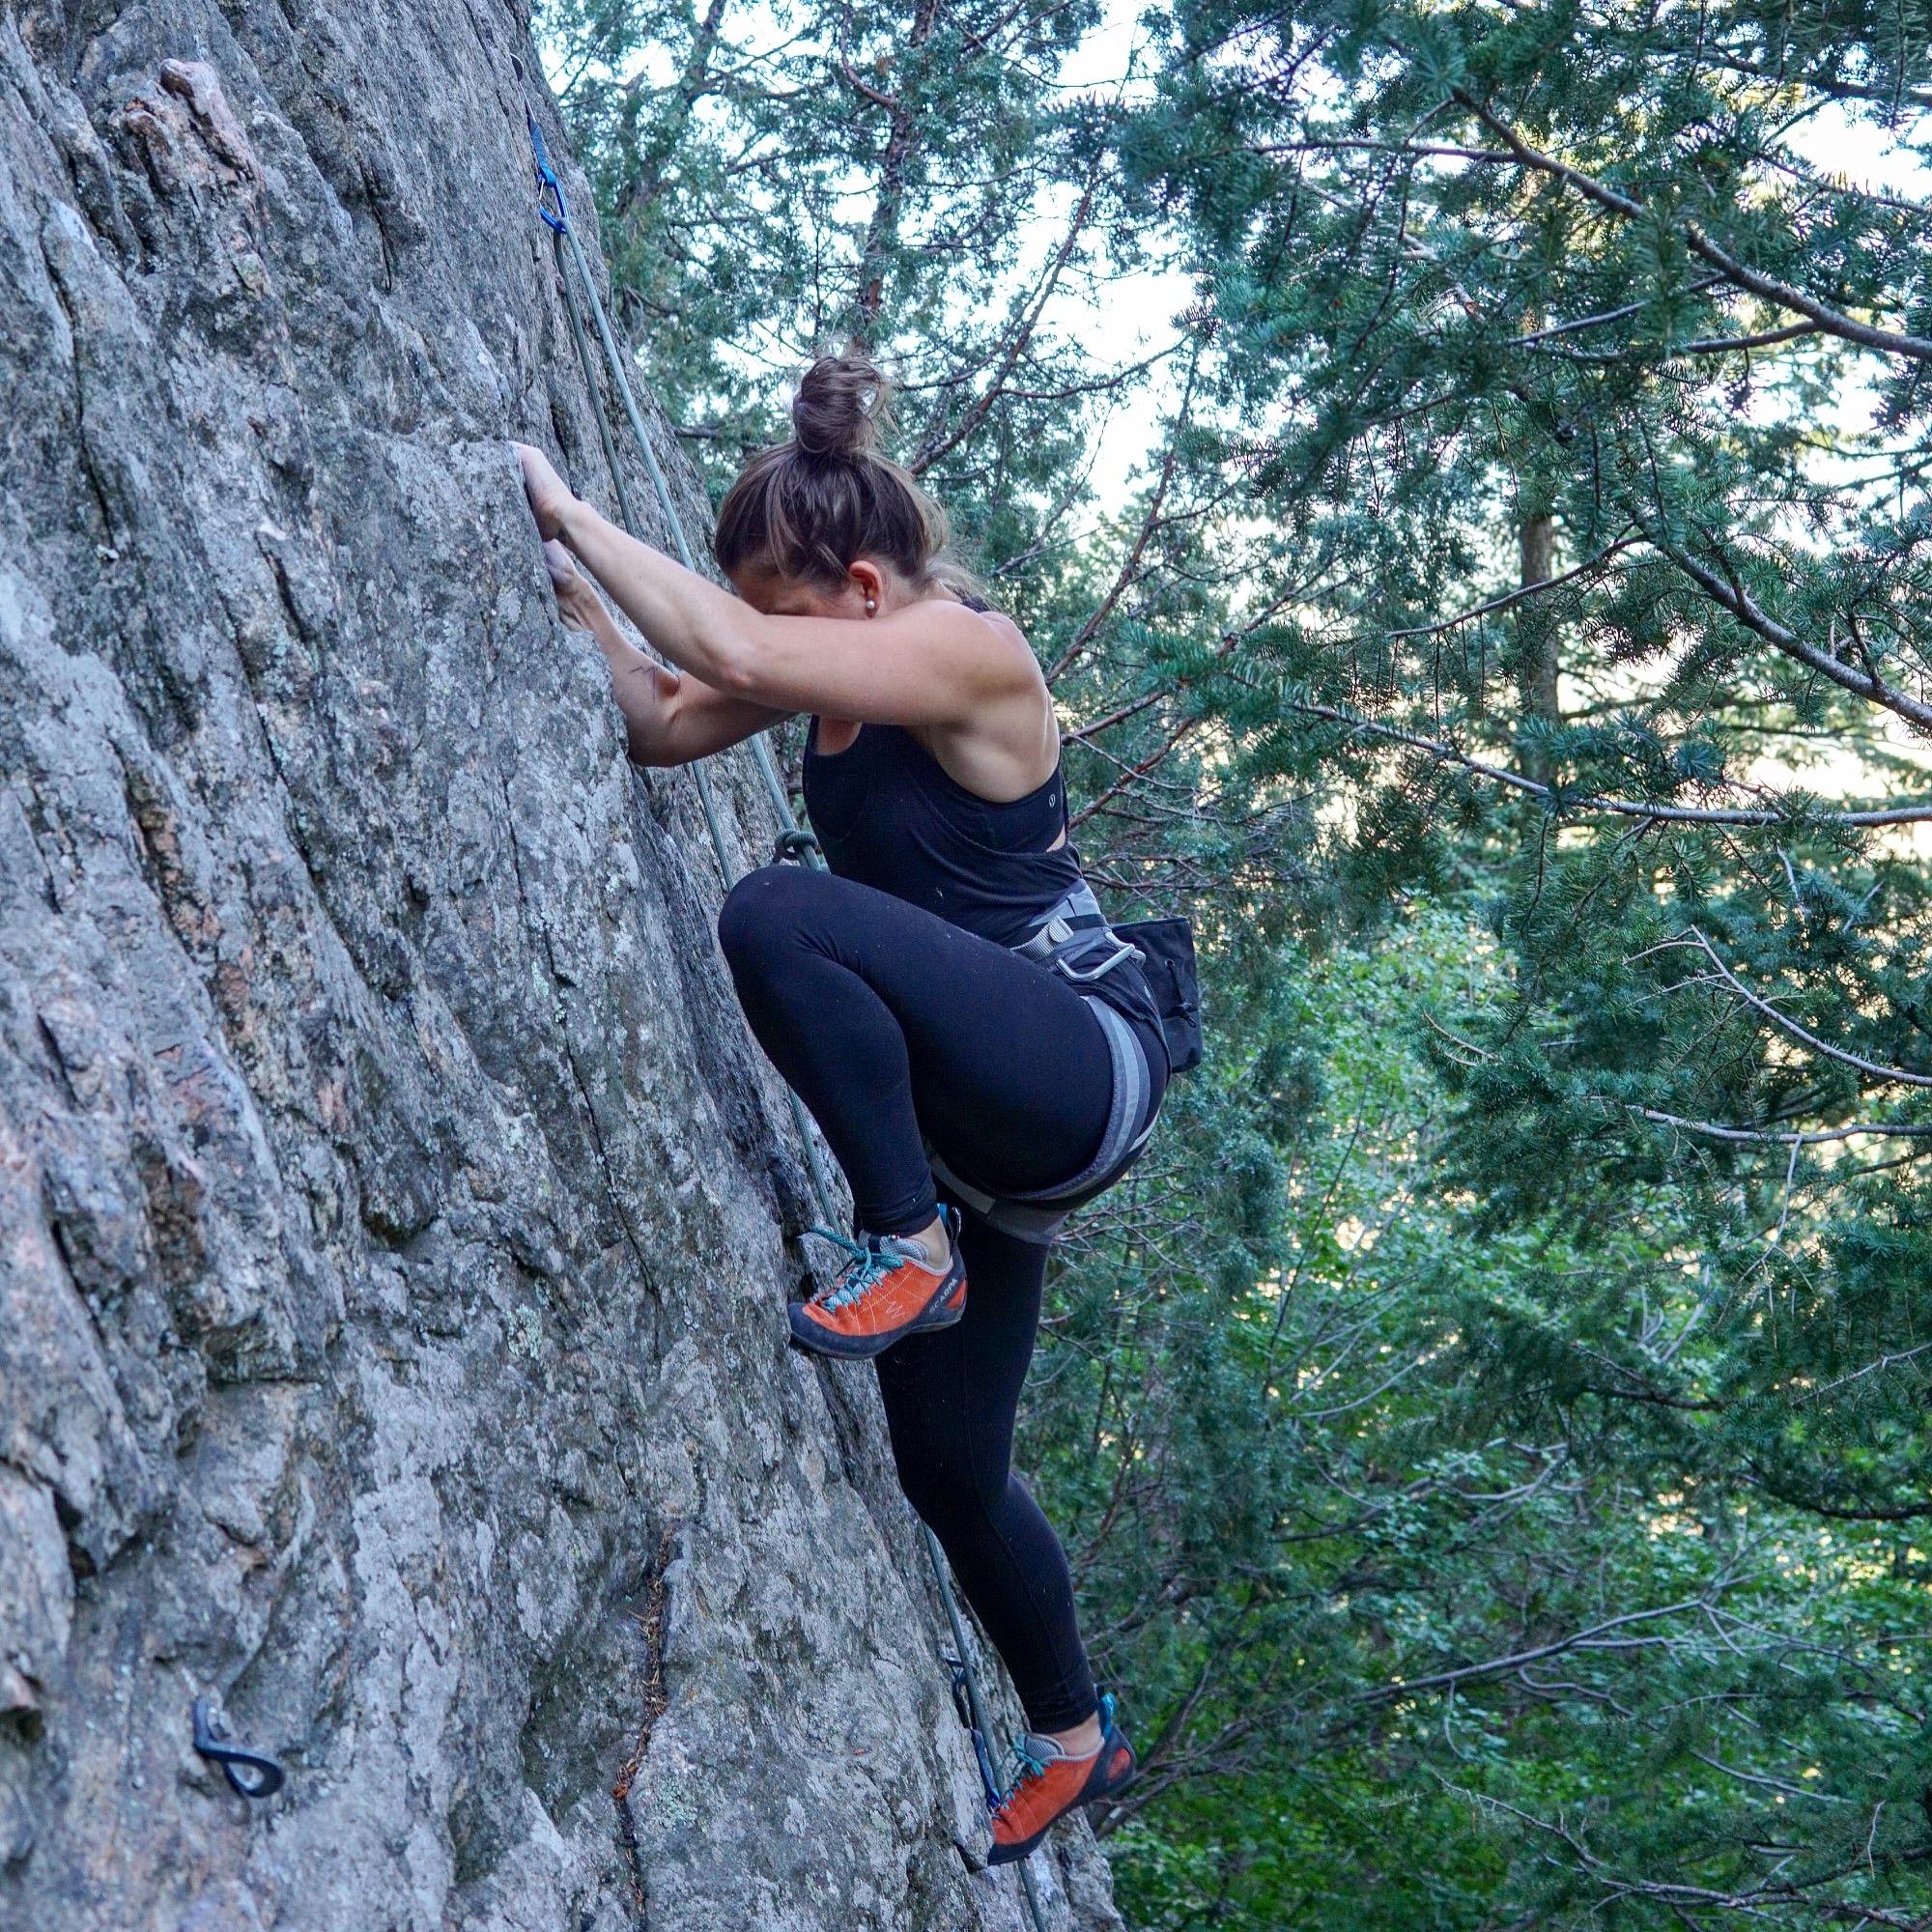 stephanie-kemp-rock-climbing-in-colorado